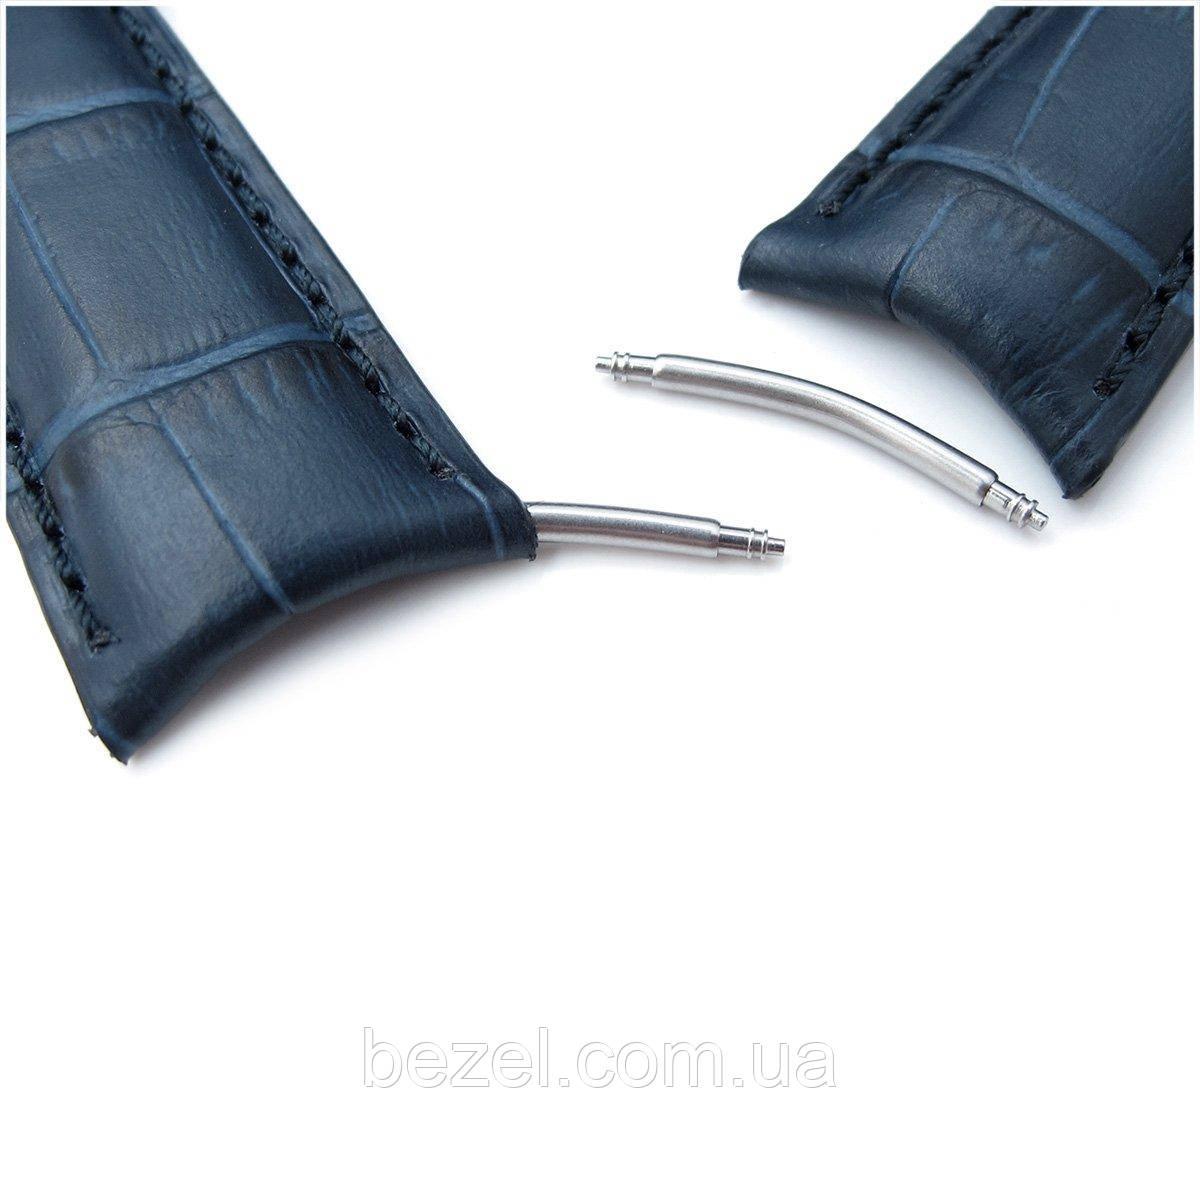 20mm or 22mm CrocoCalf (Croco Grain) Dark Blue Semi-Curved Watch strap, Blue Stitching, P